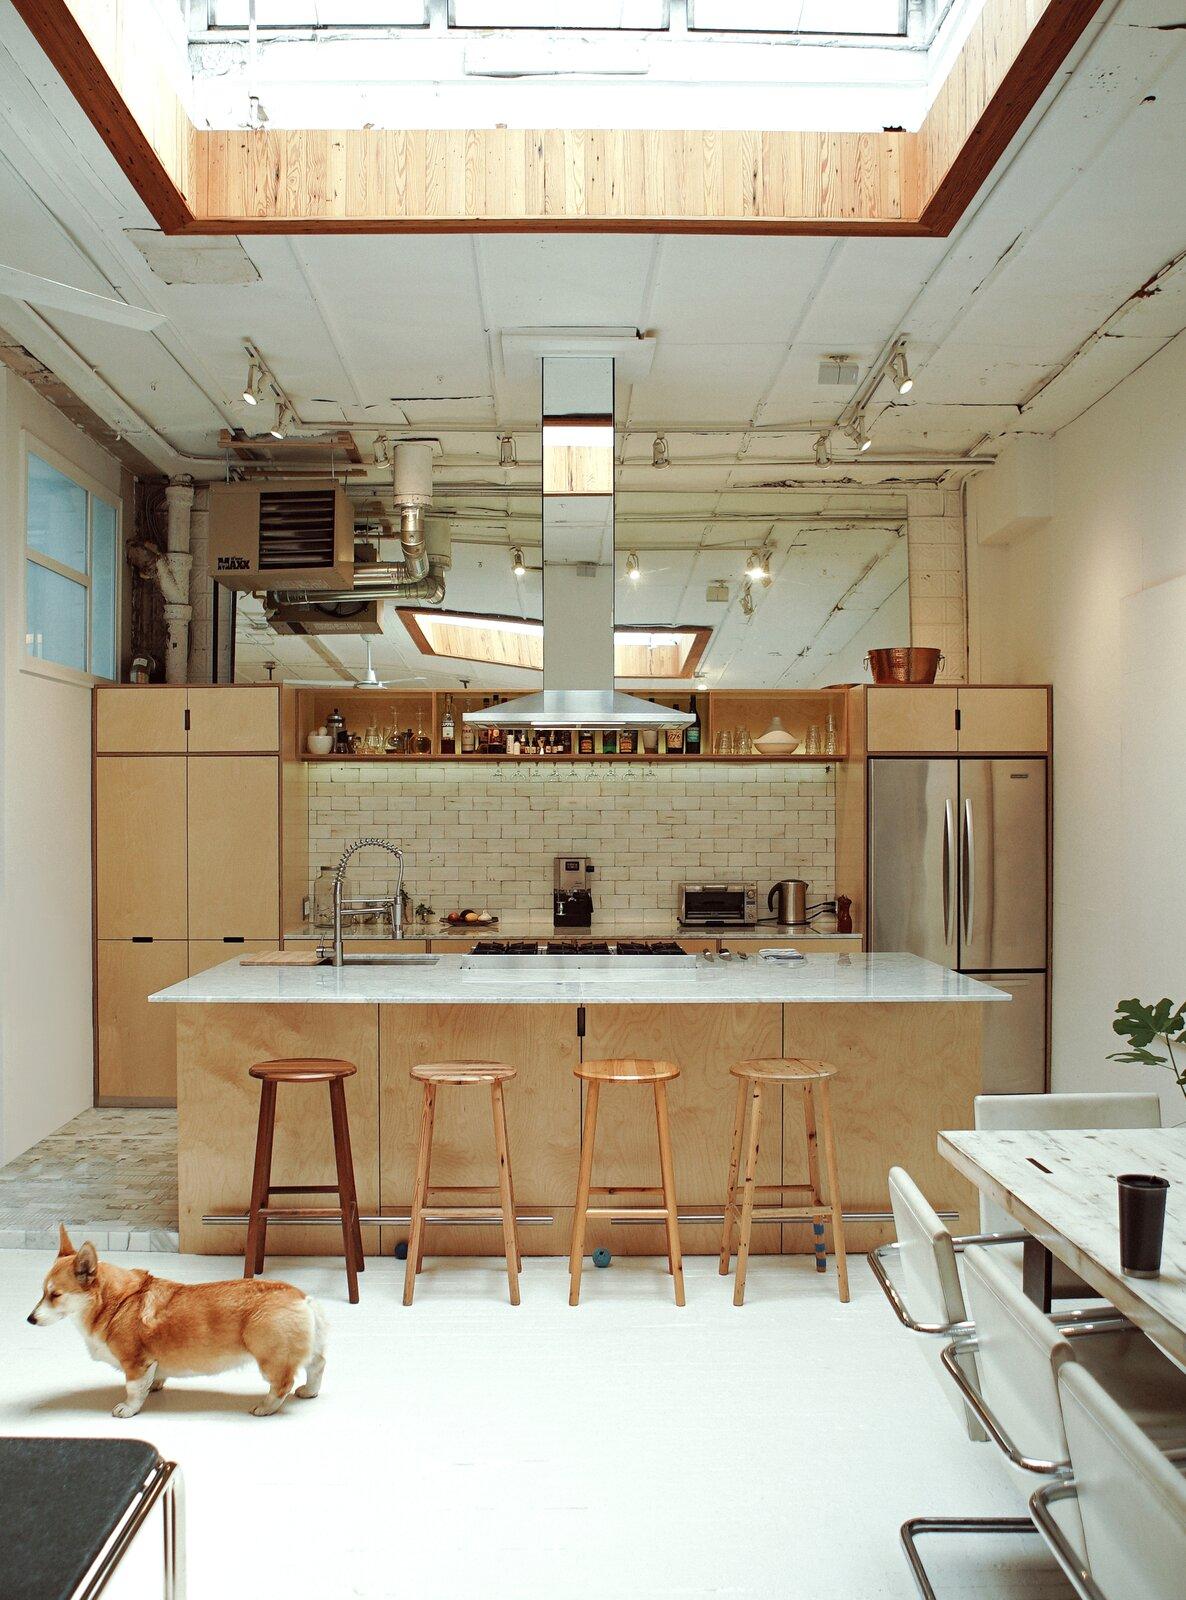 Photo 7 of 7 in Designer to Know: Manjiro Design